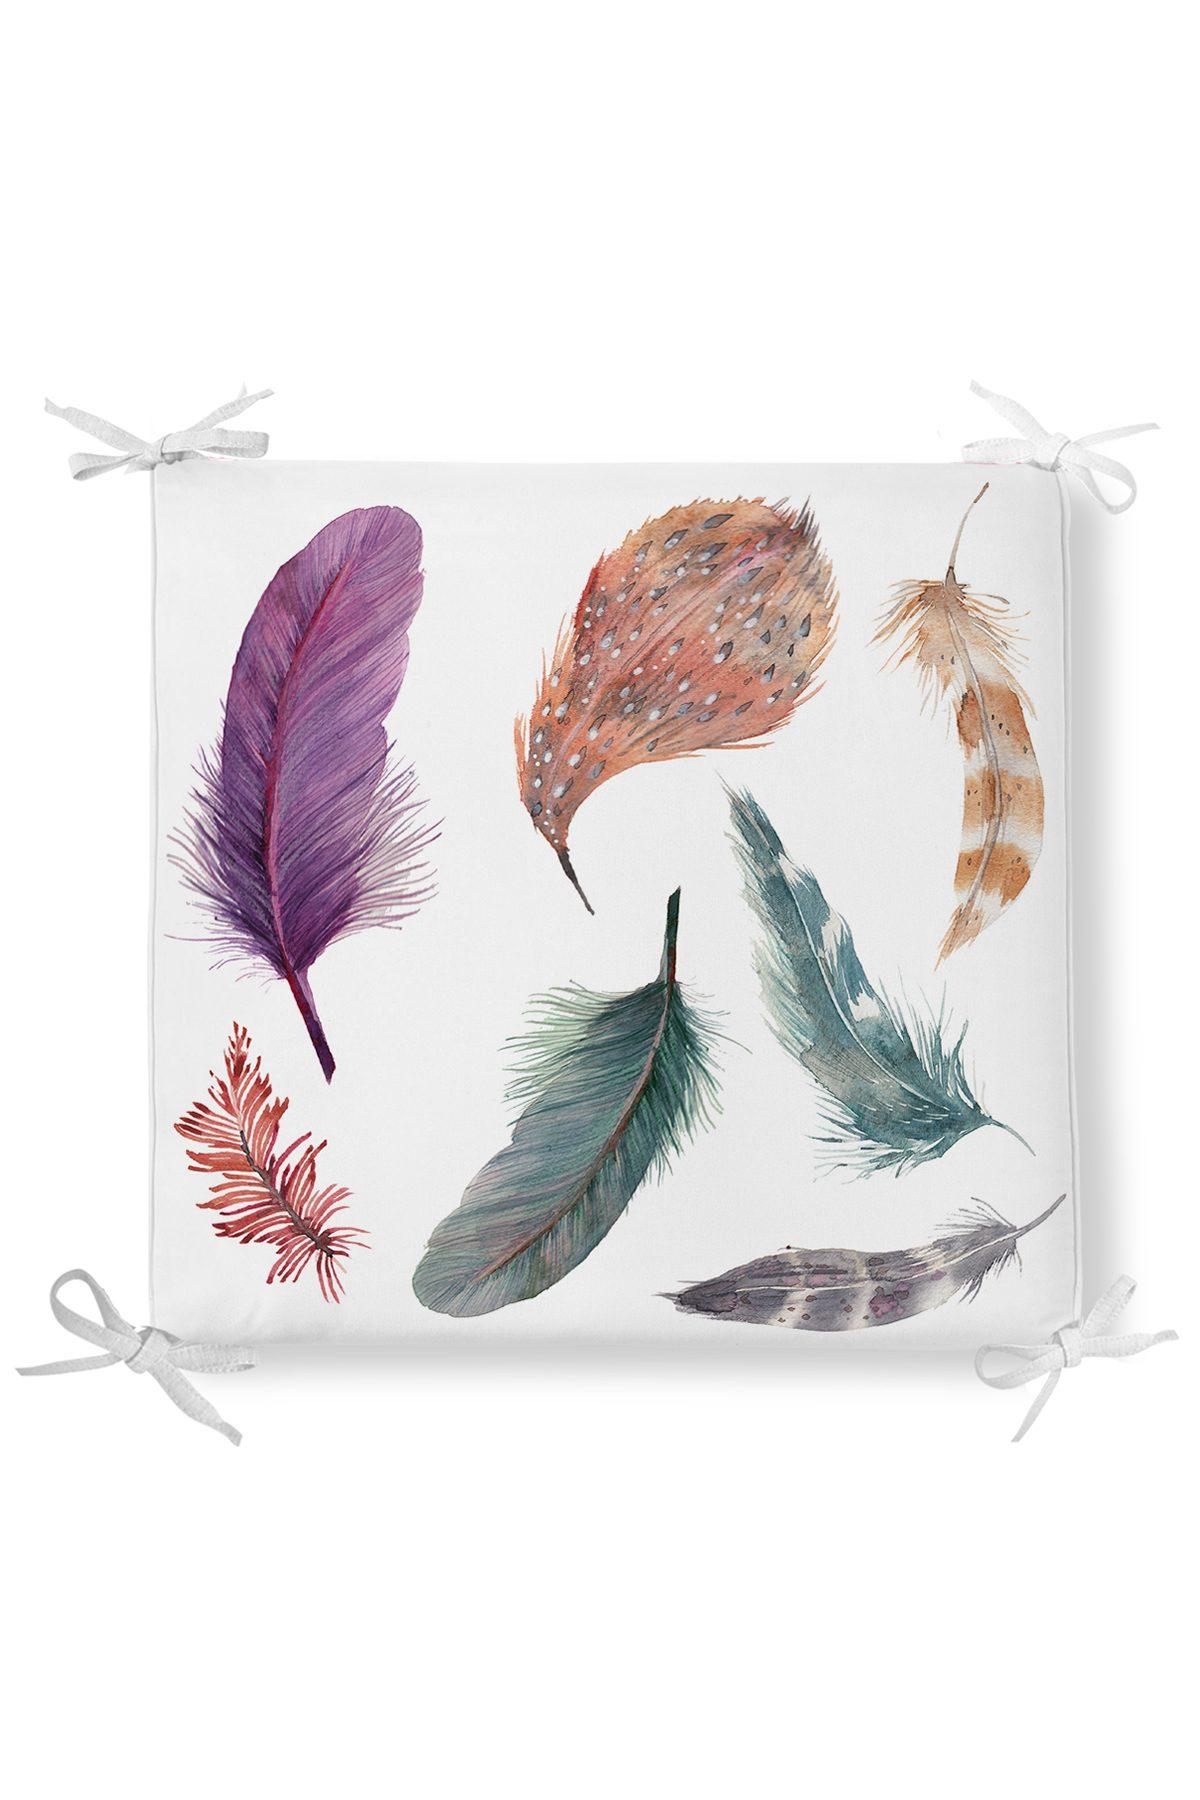 Kuş Tüyü Desenli Dekorati Kare Sandalye Minderi Realhomes